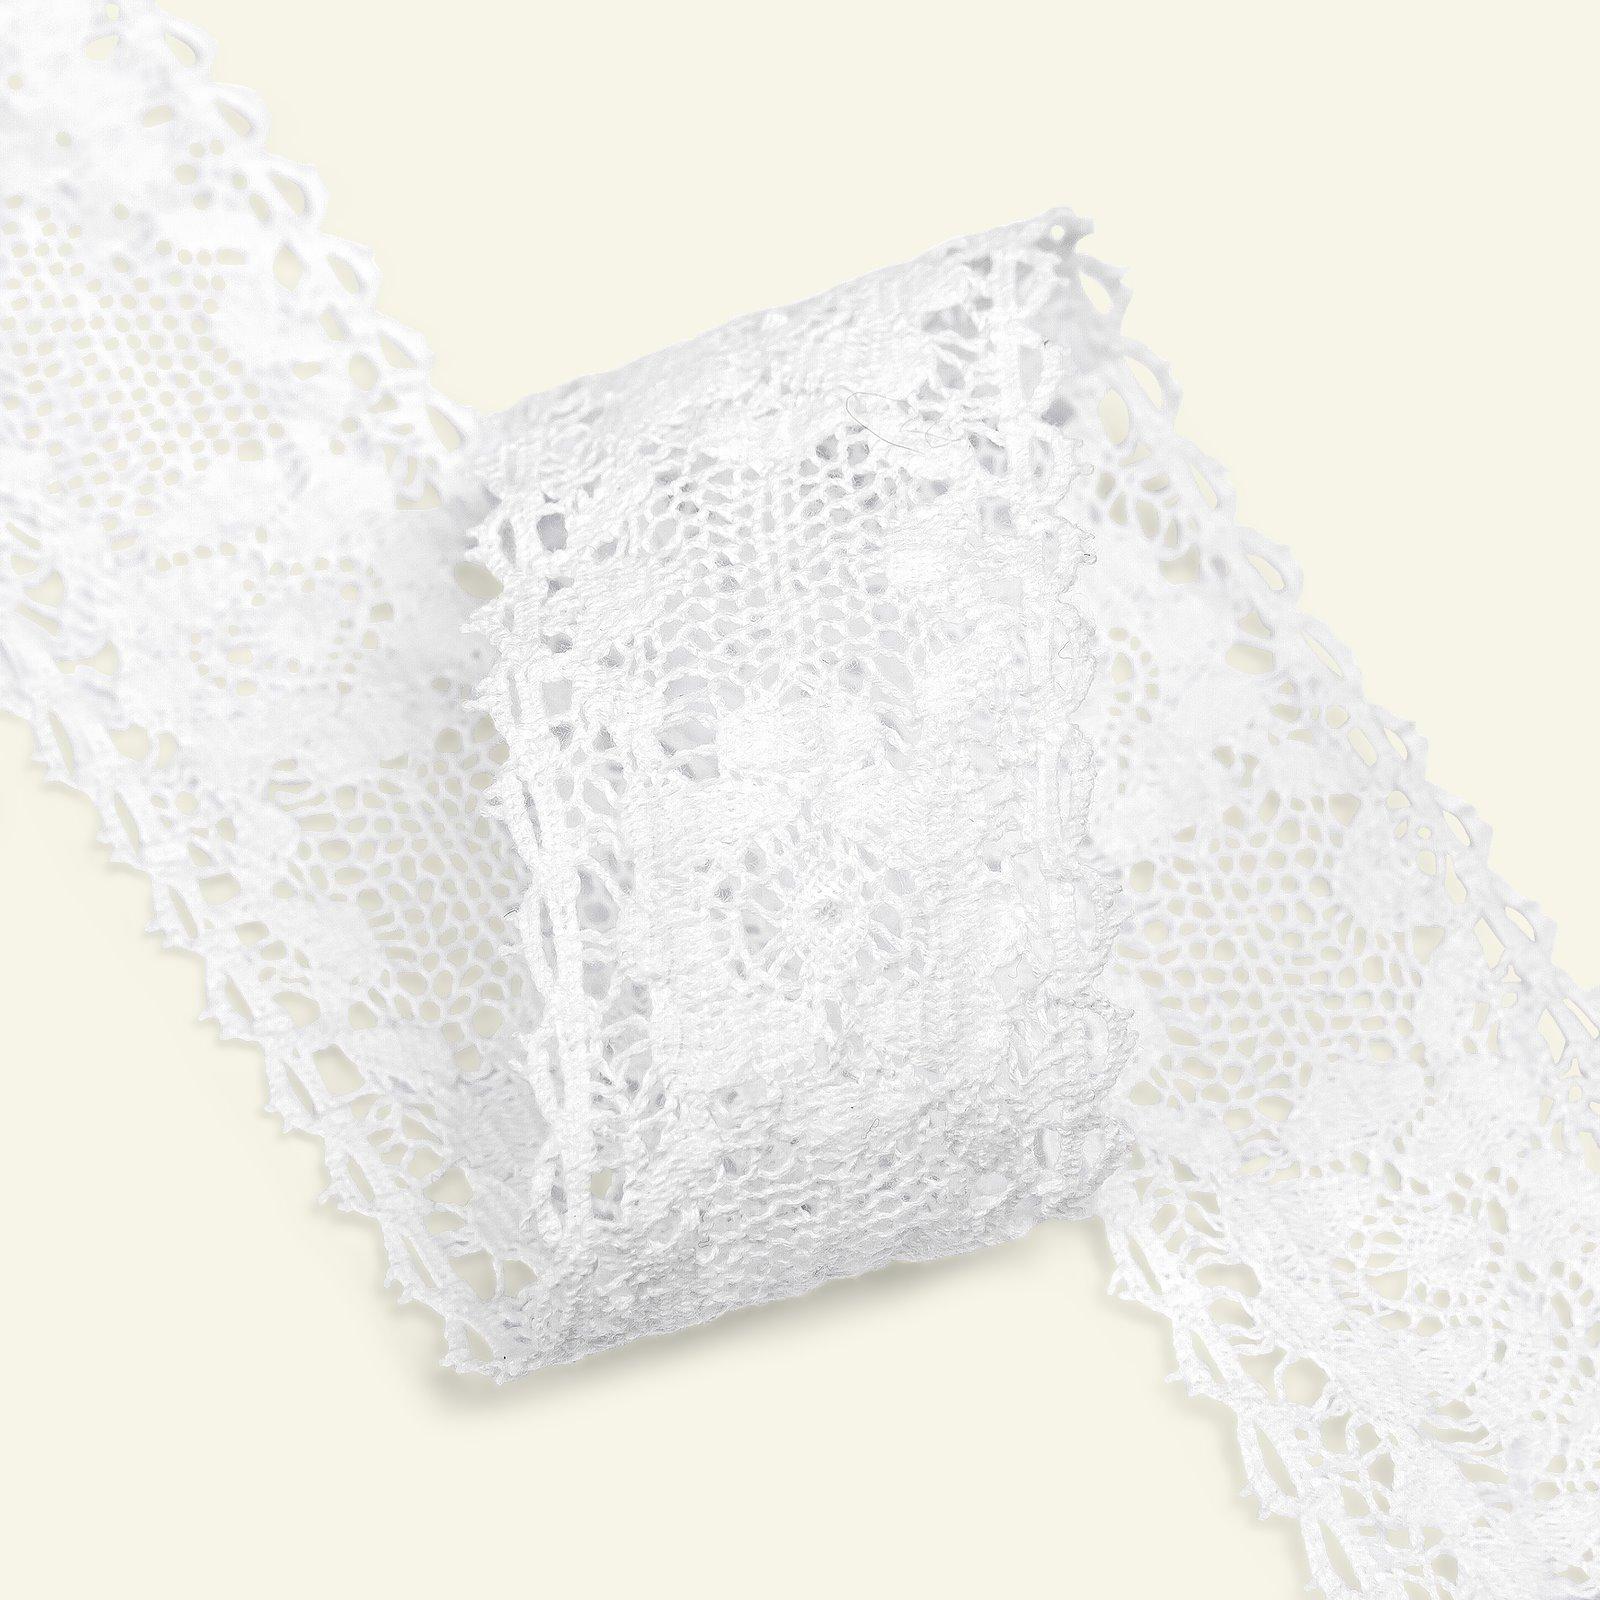 Lace cotton 45mm white 1,5m 25178_pack